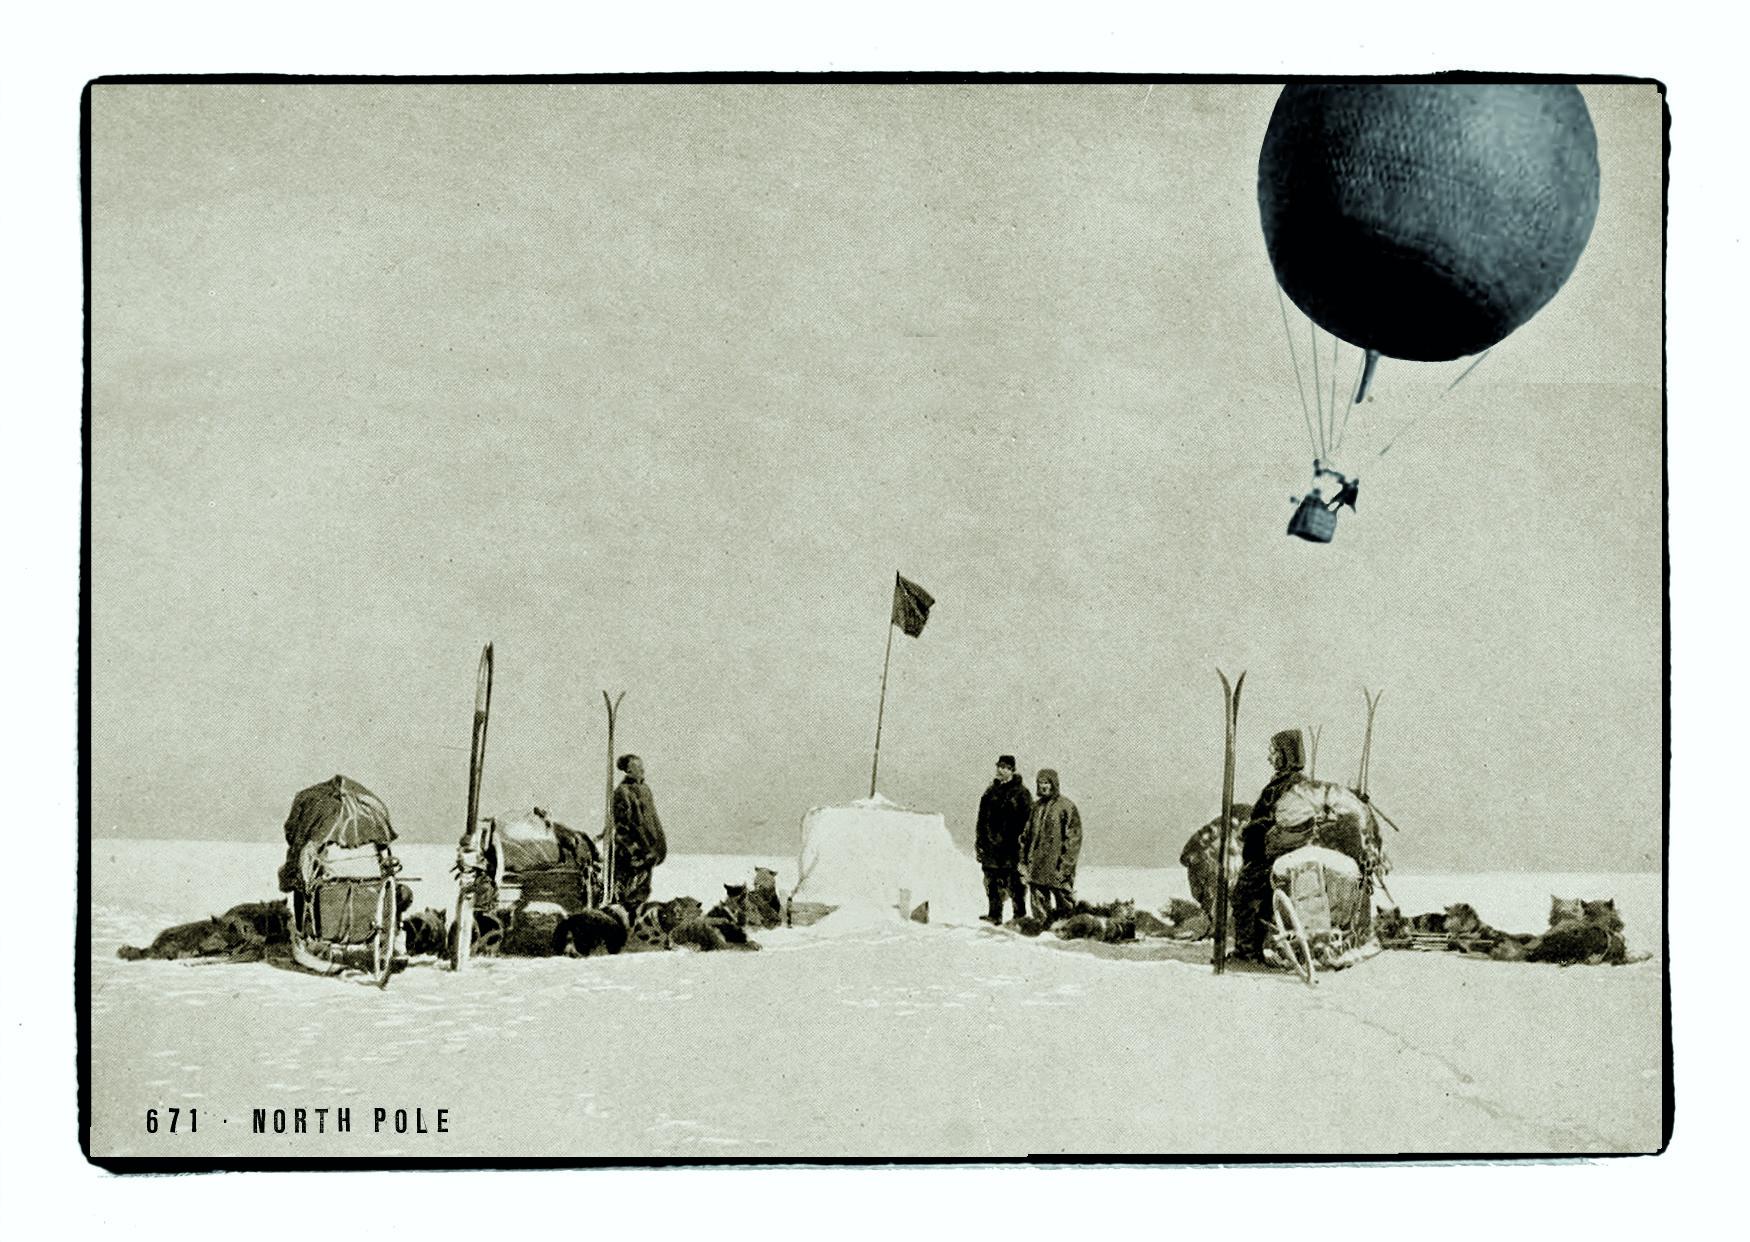 Spelterini am Nordpol - Postkarte